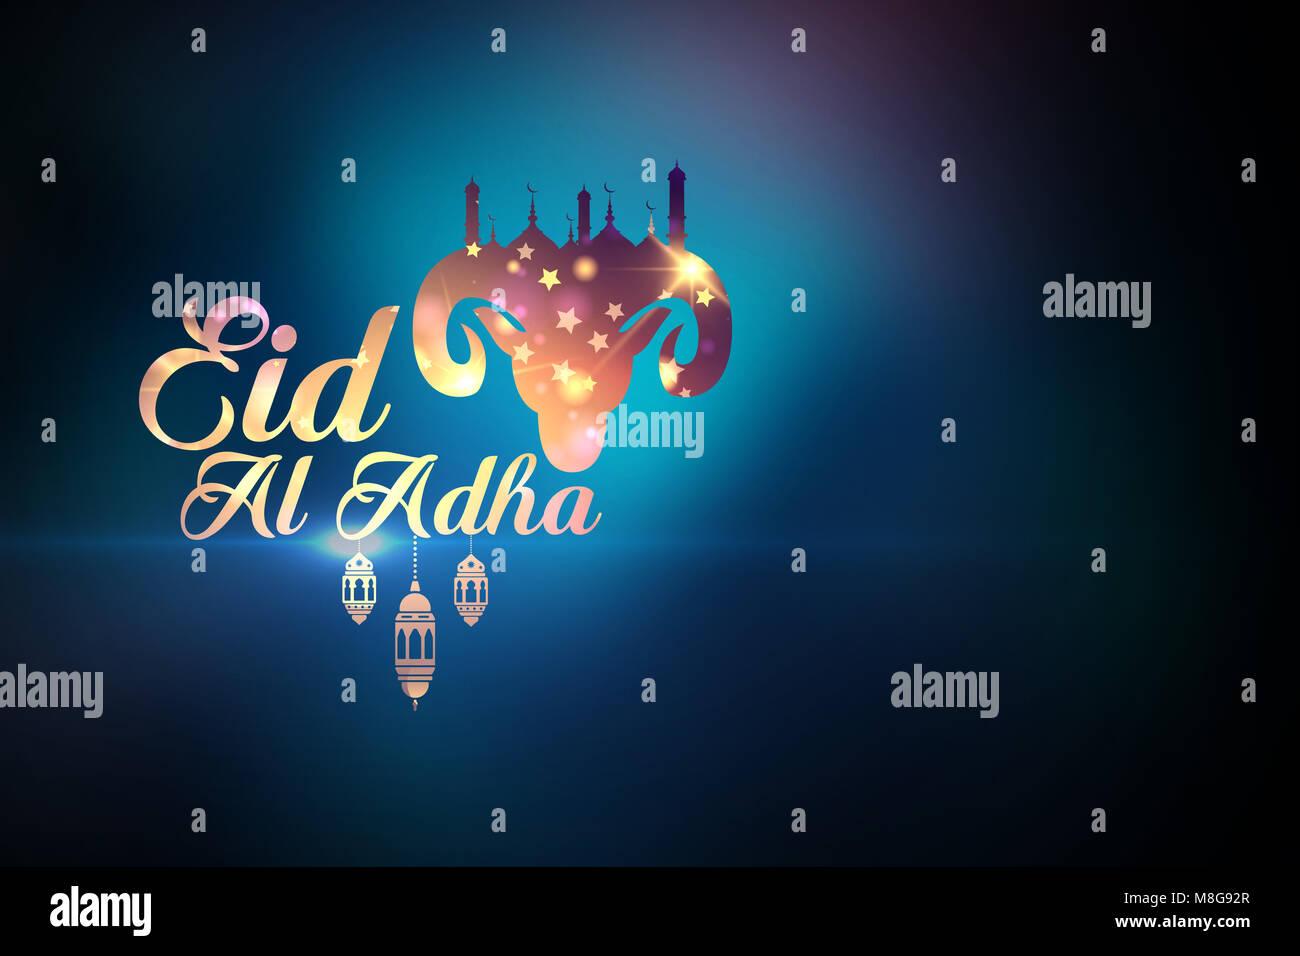 Eid mubarak sacrifice stock photos eid mubarak sacrifice stock eid al adha greetings m4hsunfo